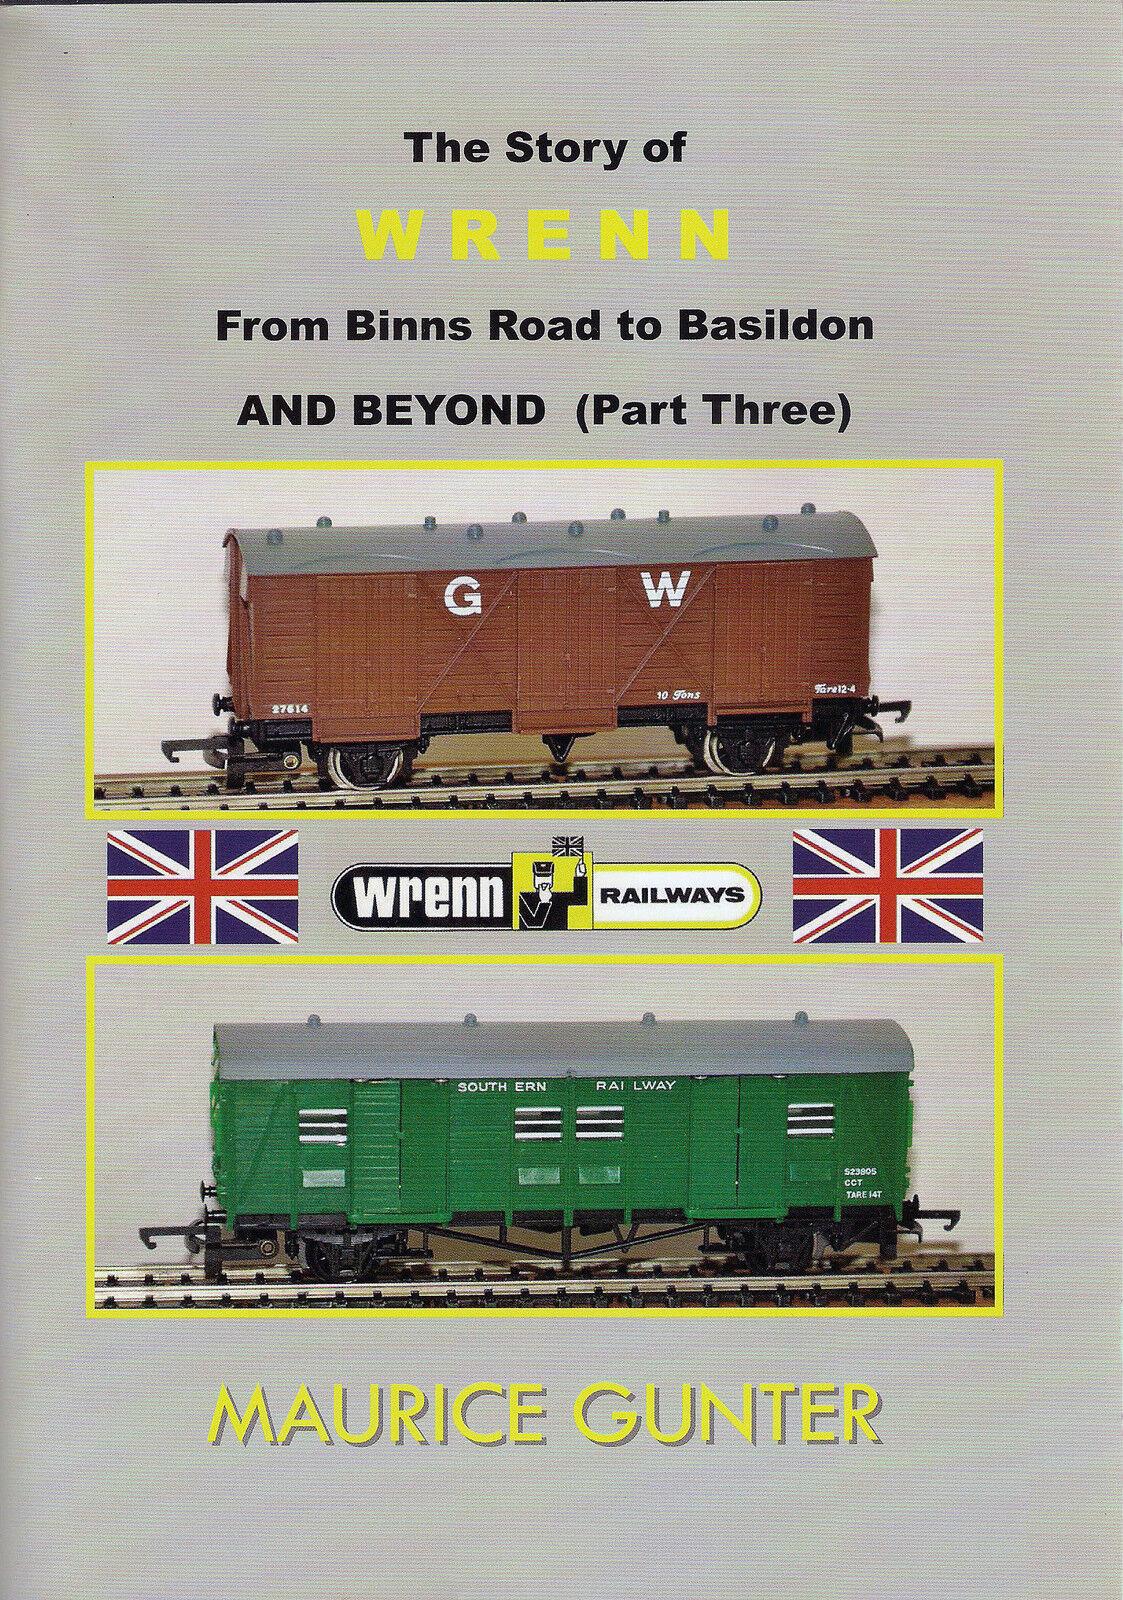 The Story of Wrenn (PART 3) From Binns Rd to Basildon & Beyond NEW - WAGONS